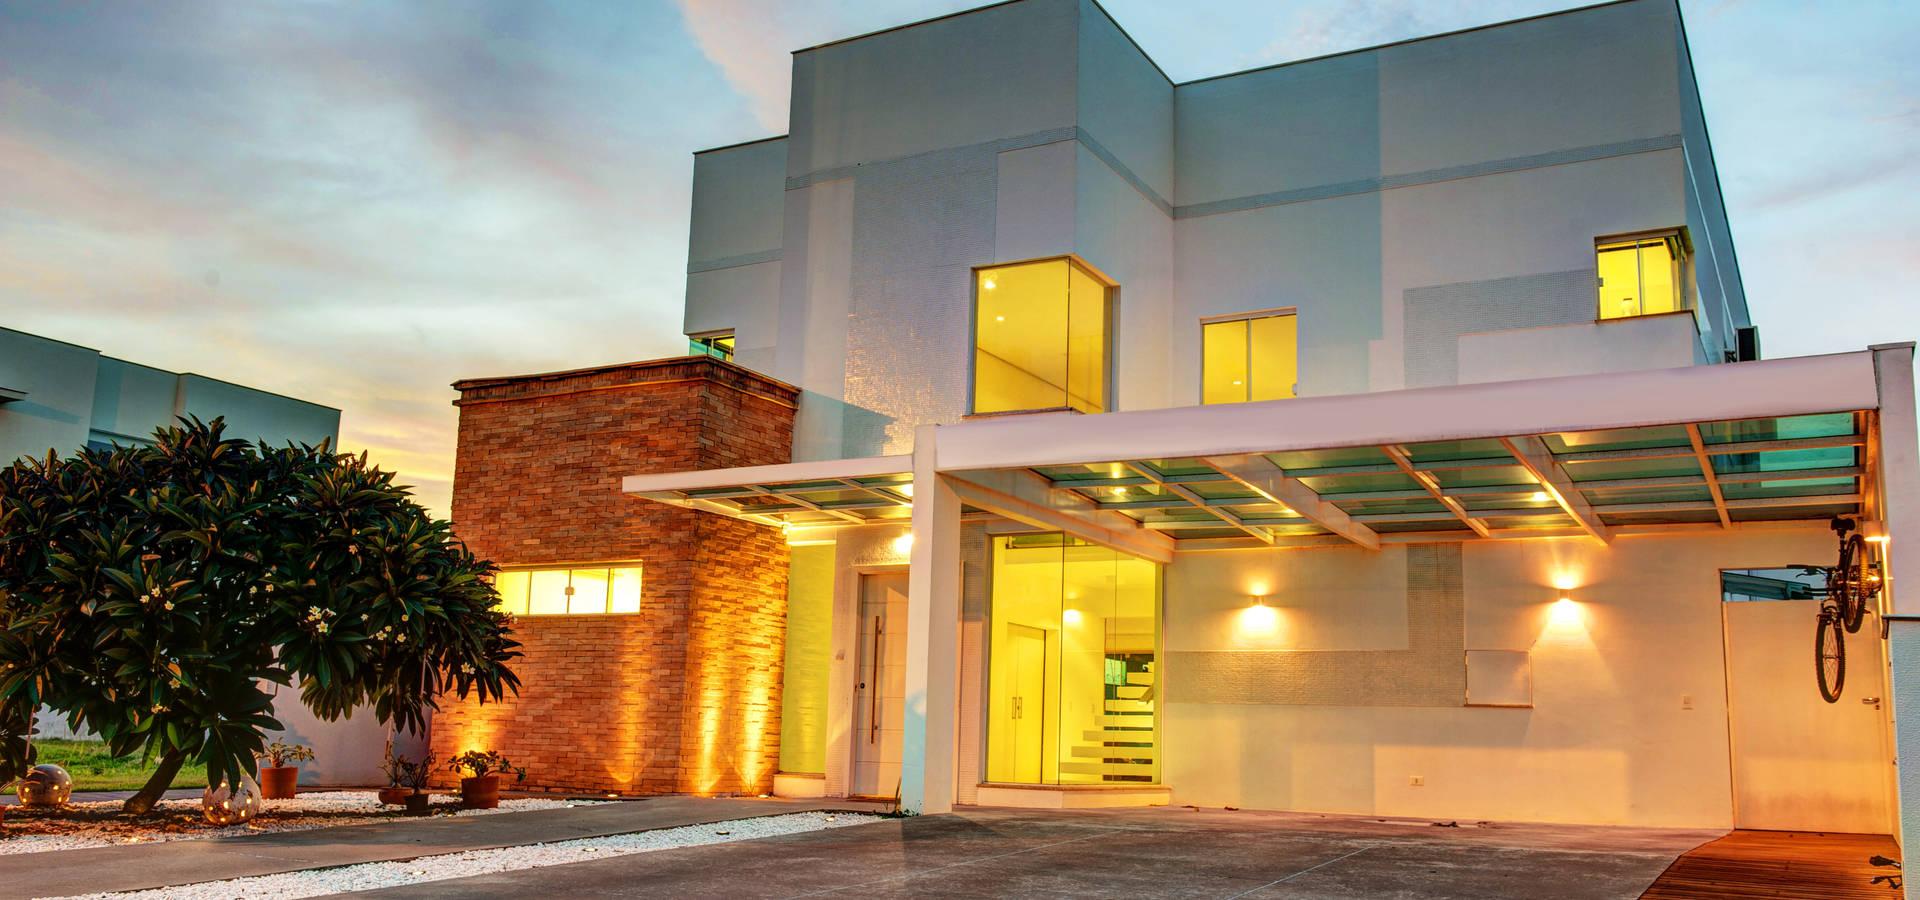 Renato Lincoln—Studio de Arquitetura